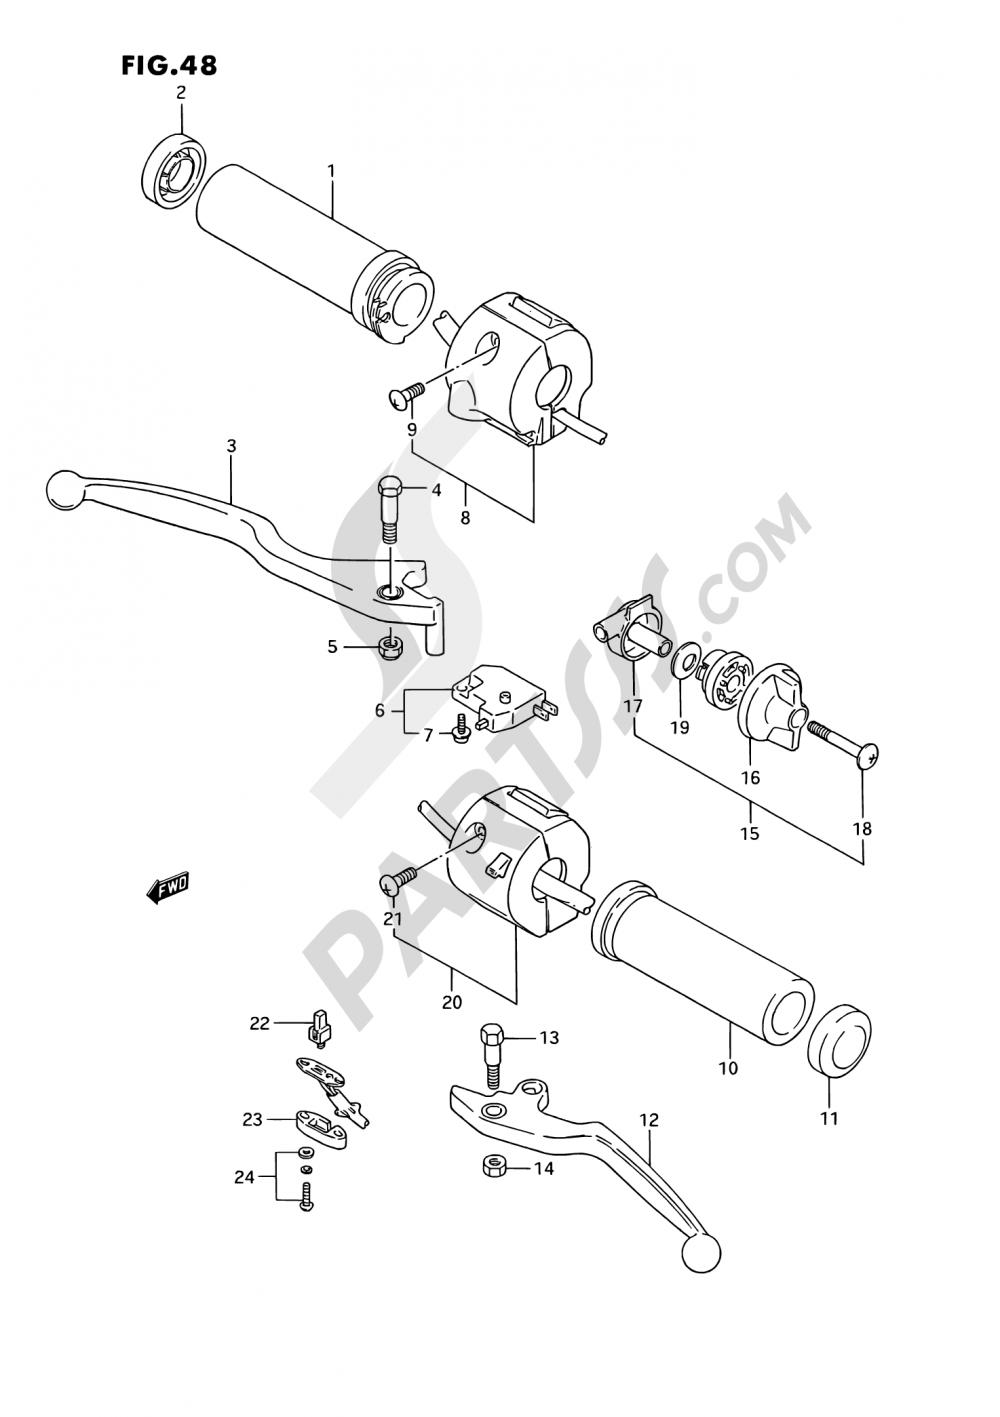 48 - HANDLE SWITCH (MODEL K/L/M/N/P/R) Suzuki VS1400GLP 1989